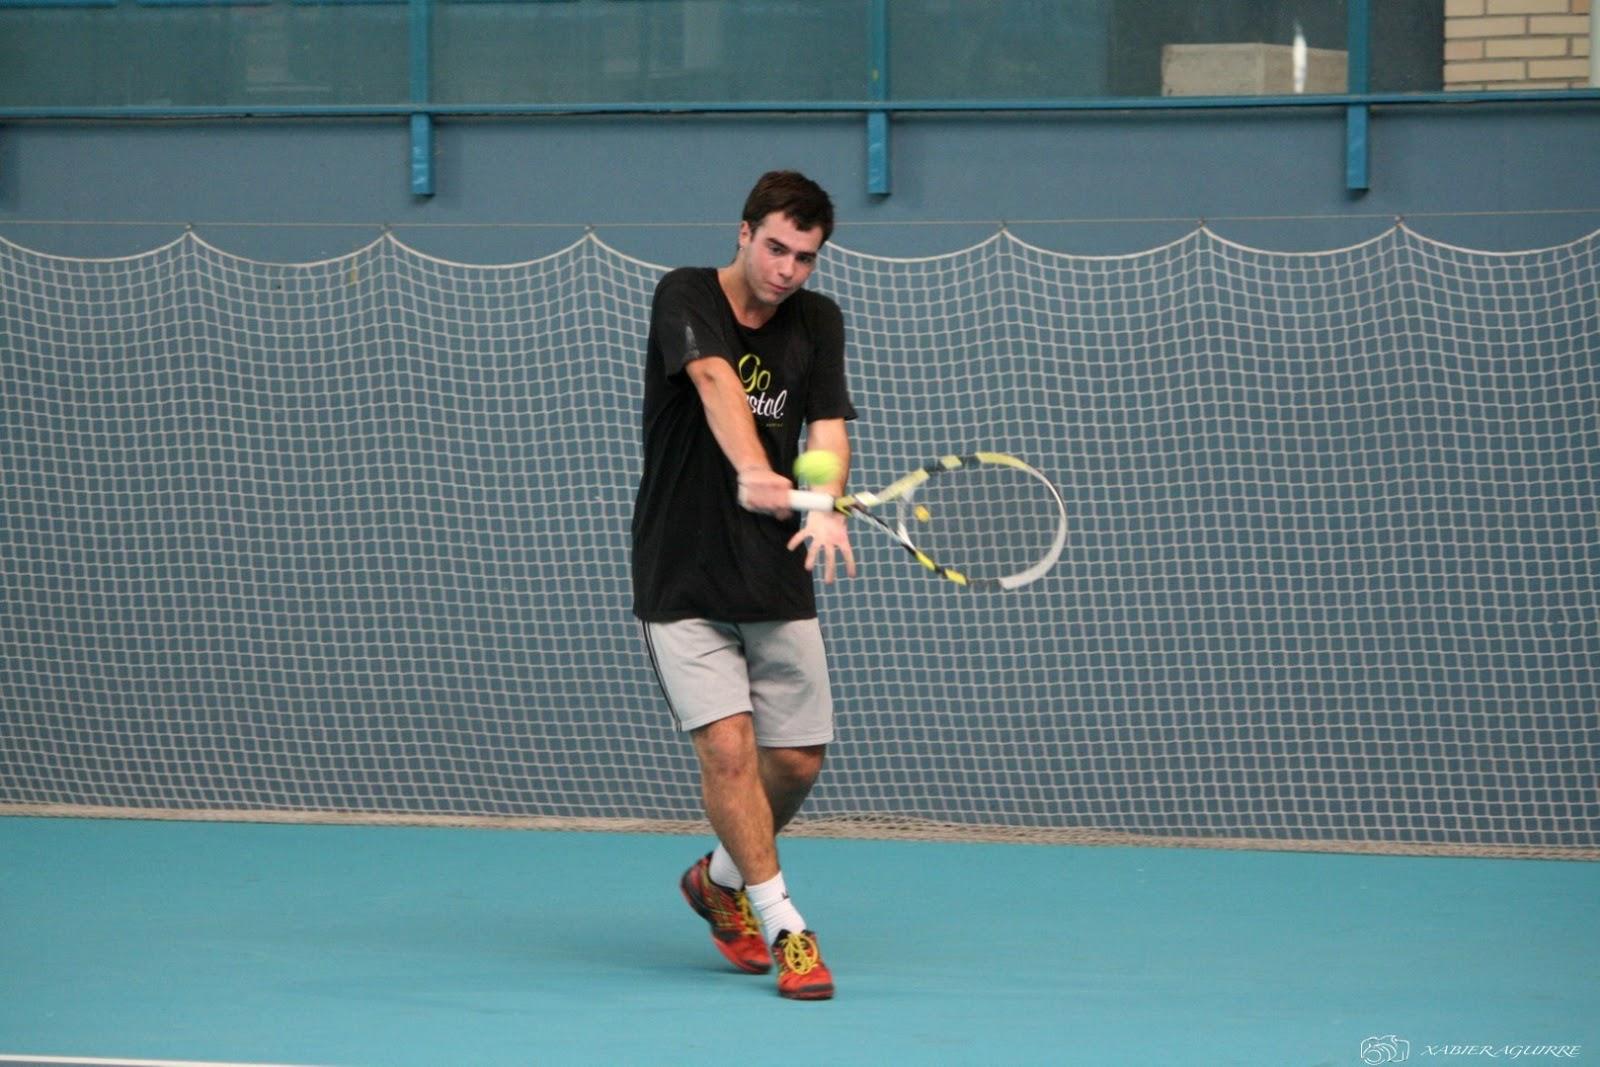 5ca2dc96496 Campeonato Navarro Absoluto de Tenis 2015. ADSJ-DKE  Fotos del ...